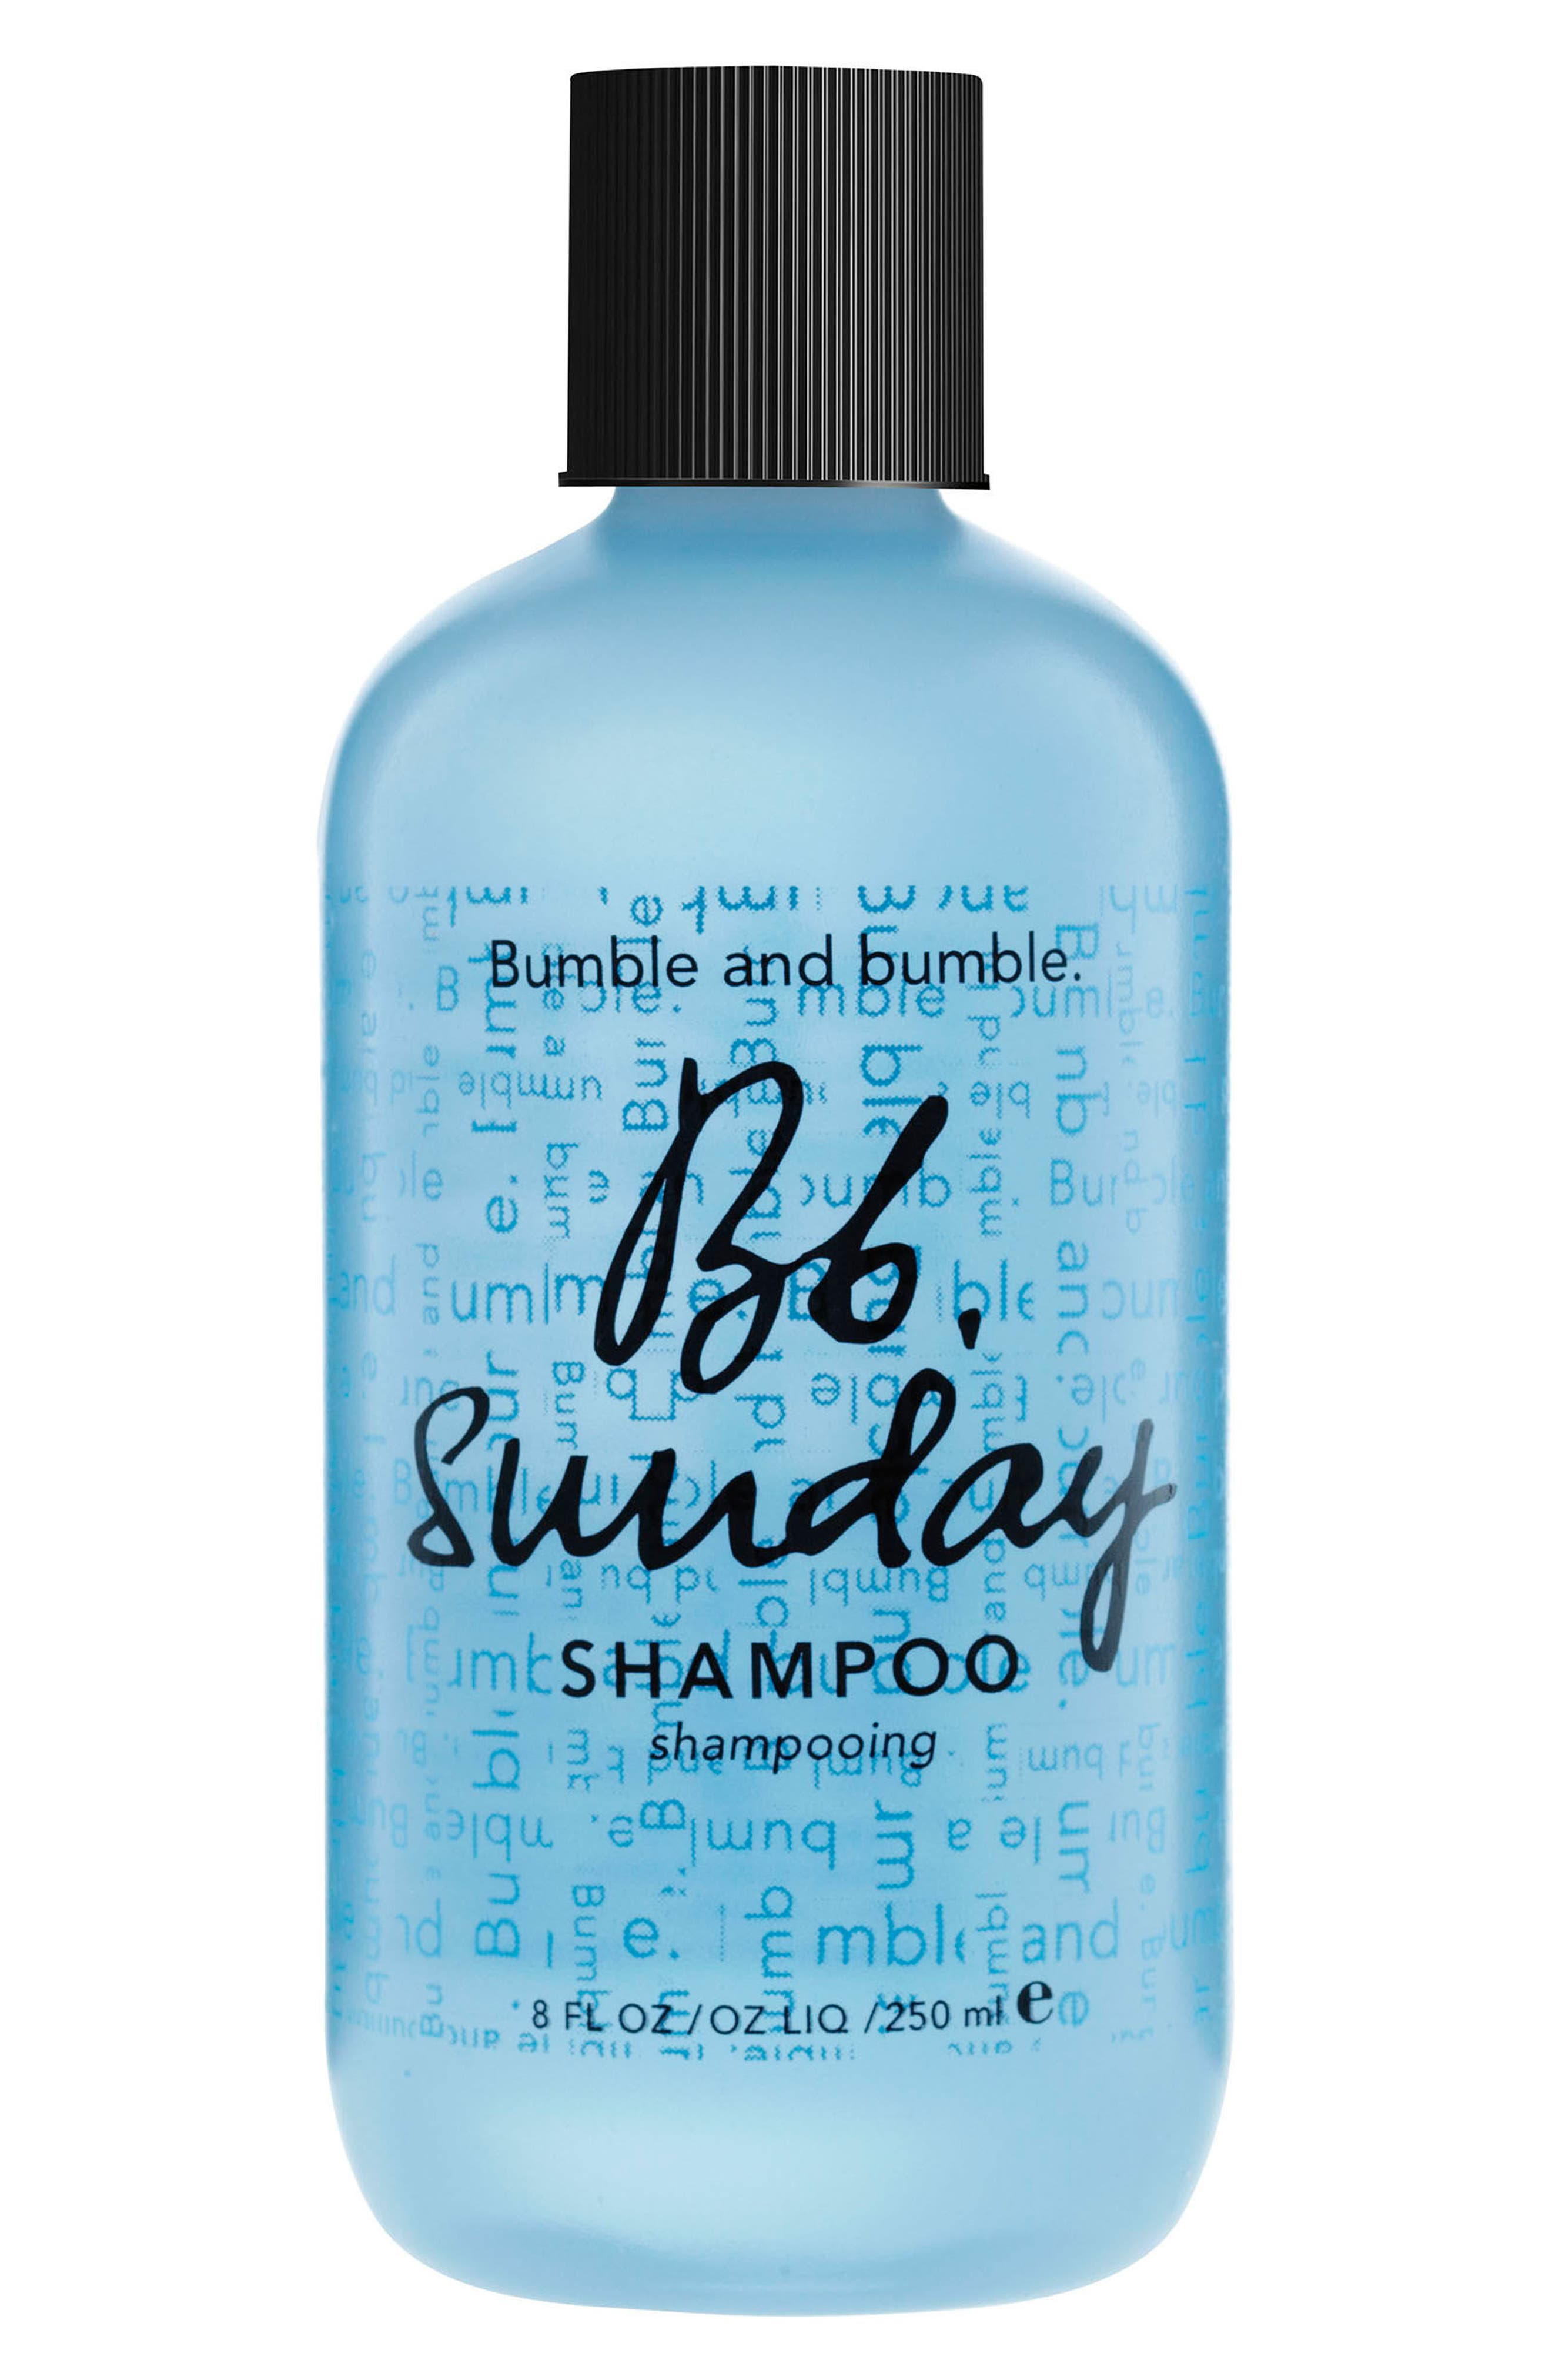 Main Image - Bumble and bumble Sunday Shampoo